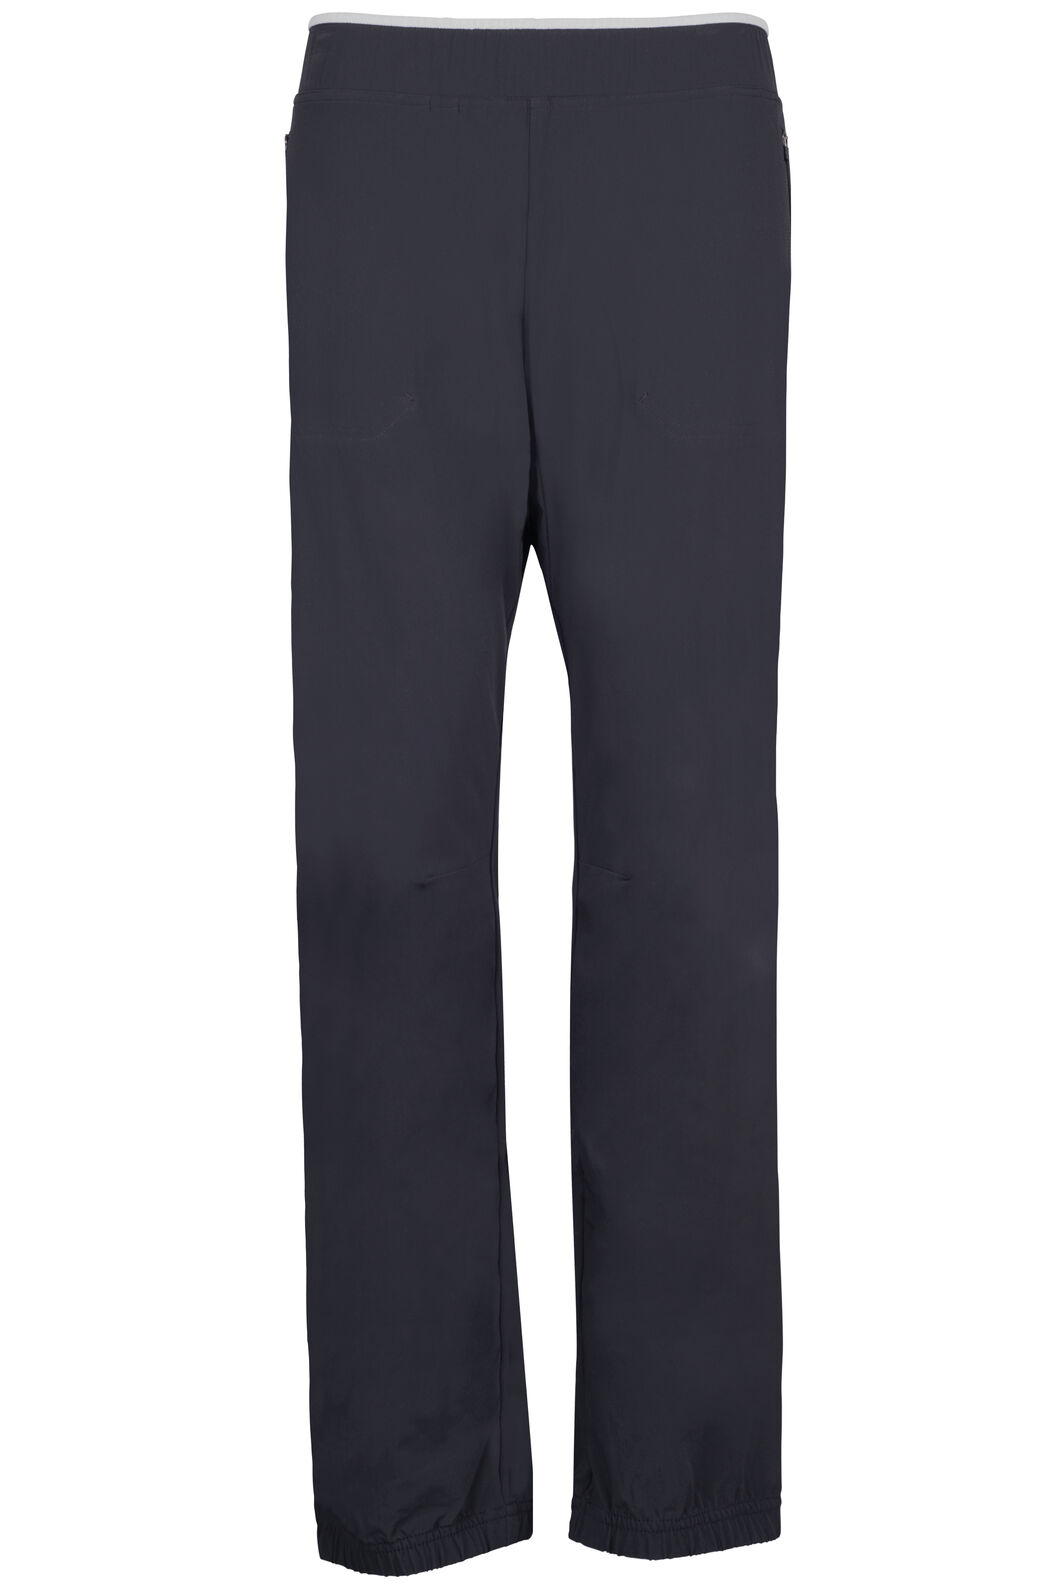 Macpac Hike Tight Pertex Equilibrium® Softshell Pants - Women's, Black, hi-res